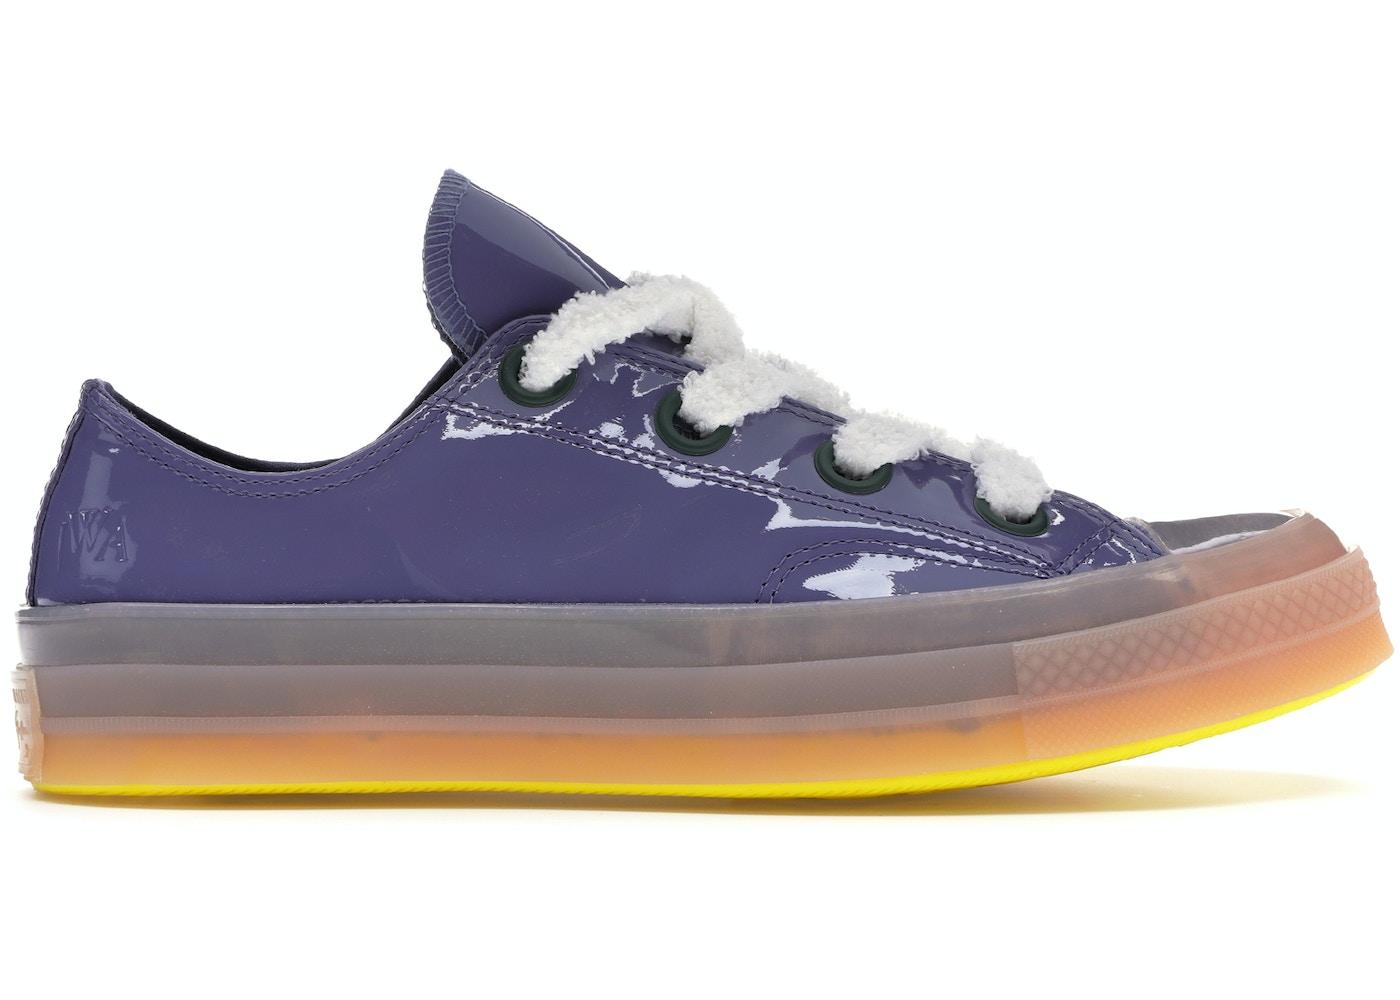 56e5025a5884 Footwear - Volatility